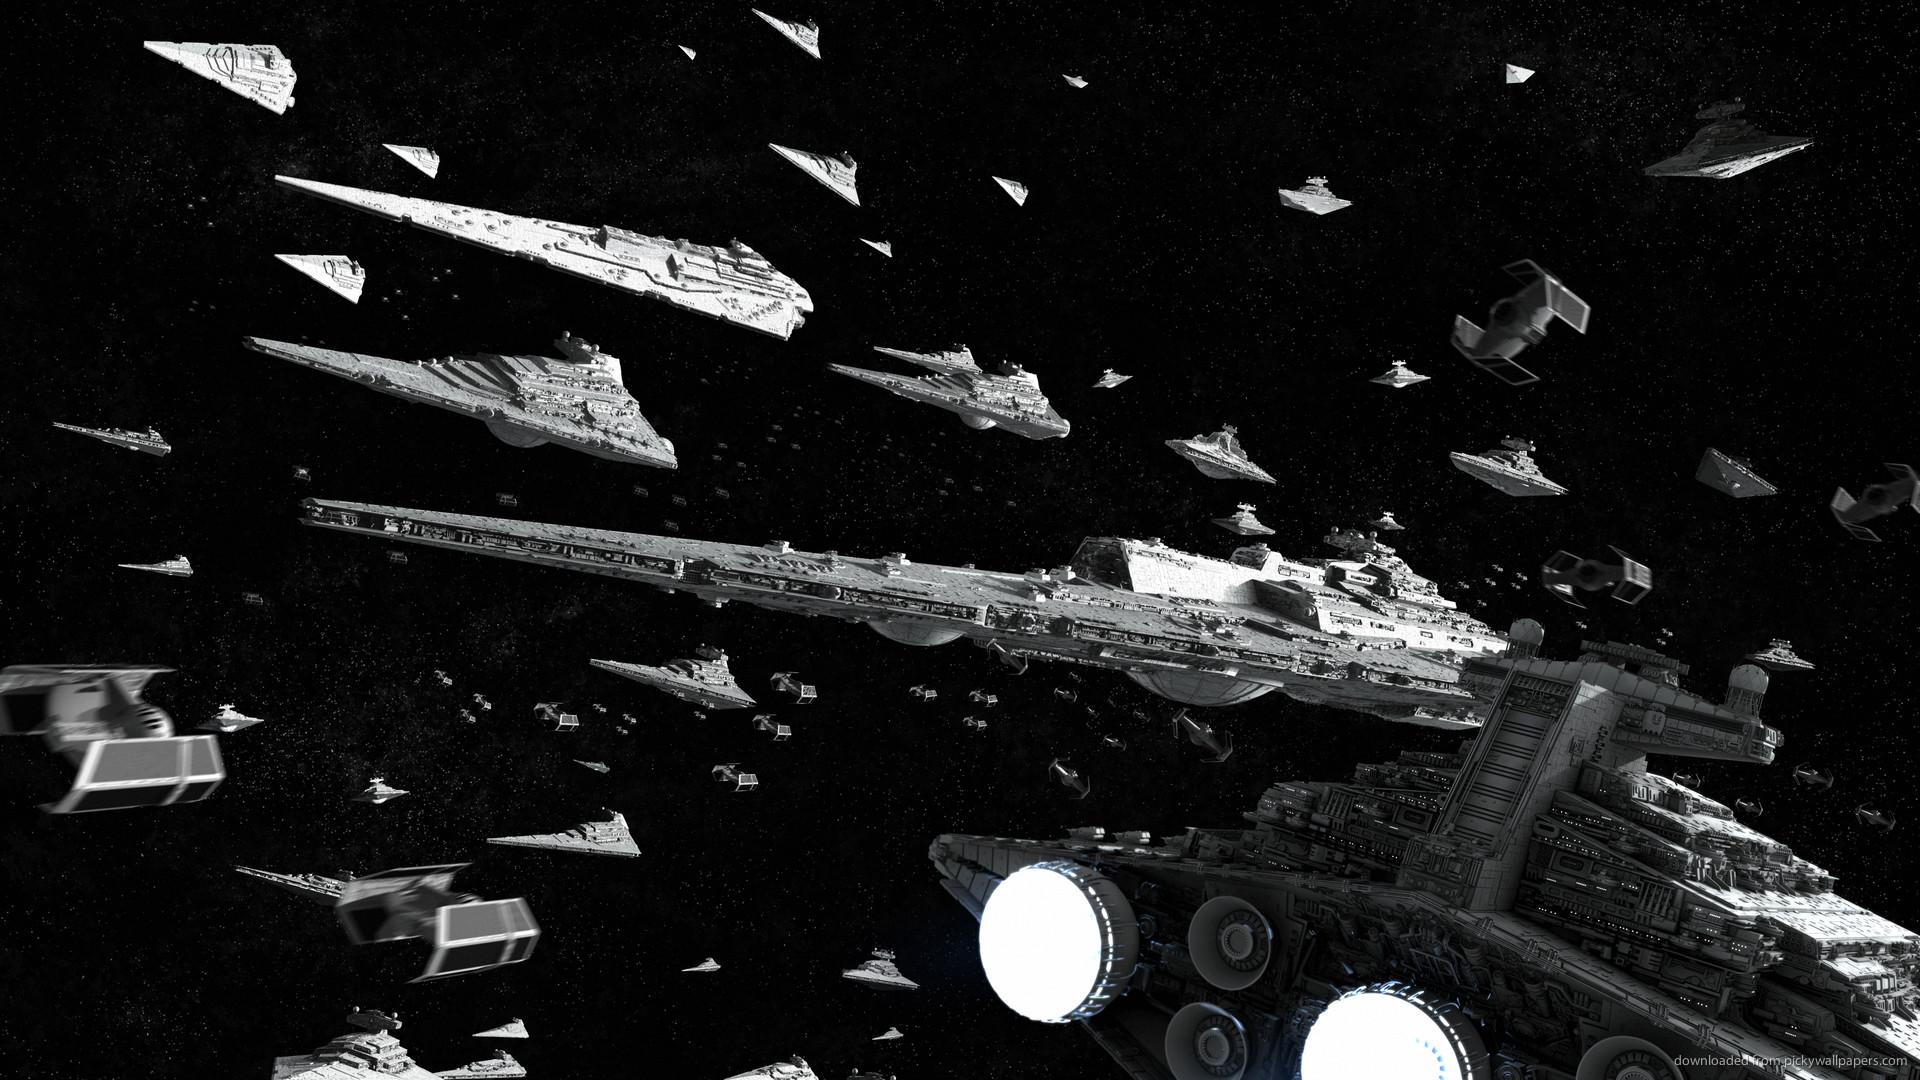 Star Wars Imperial Fleet picture